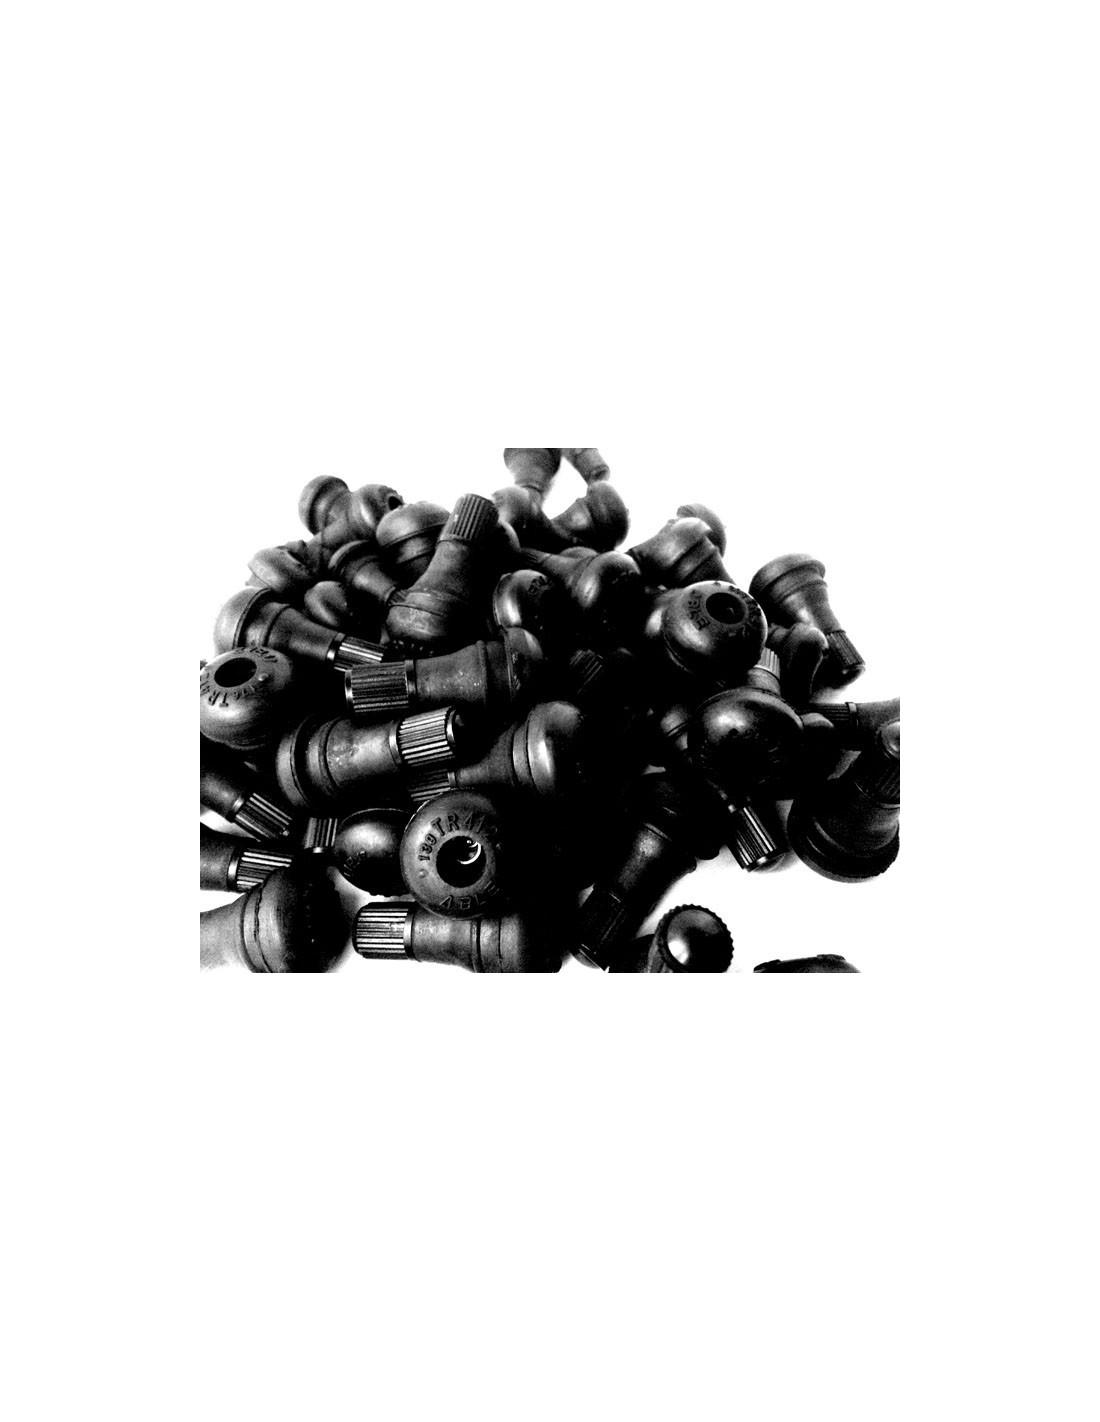 Valvulas de goma TR - 412